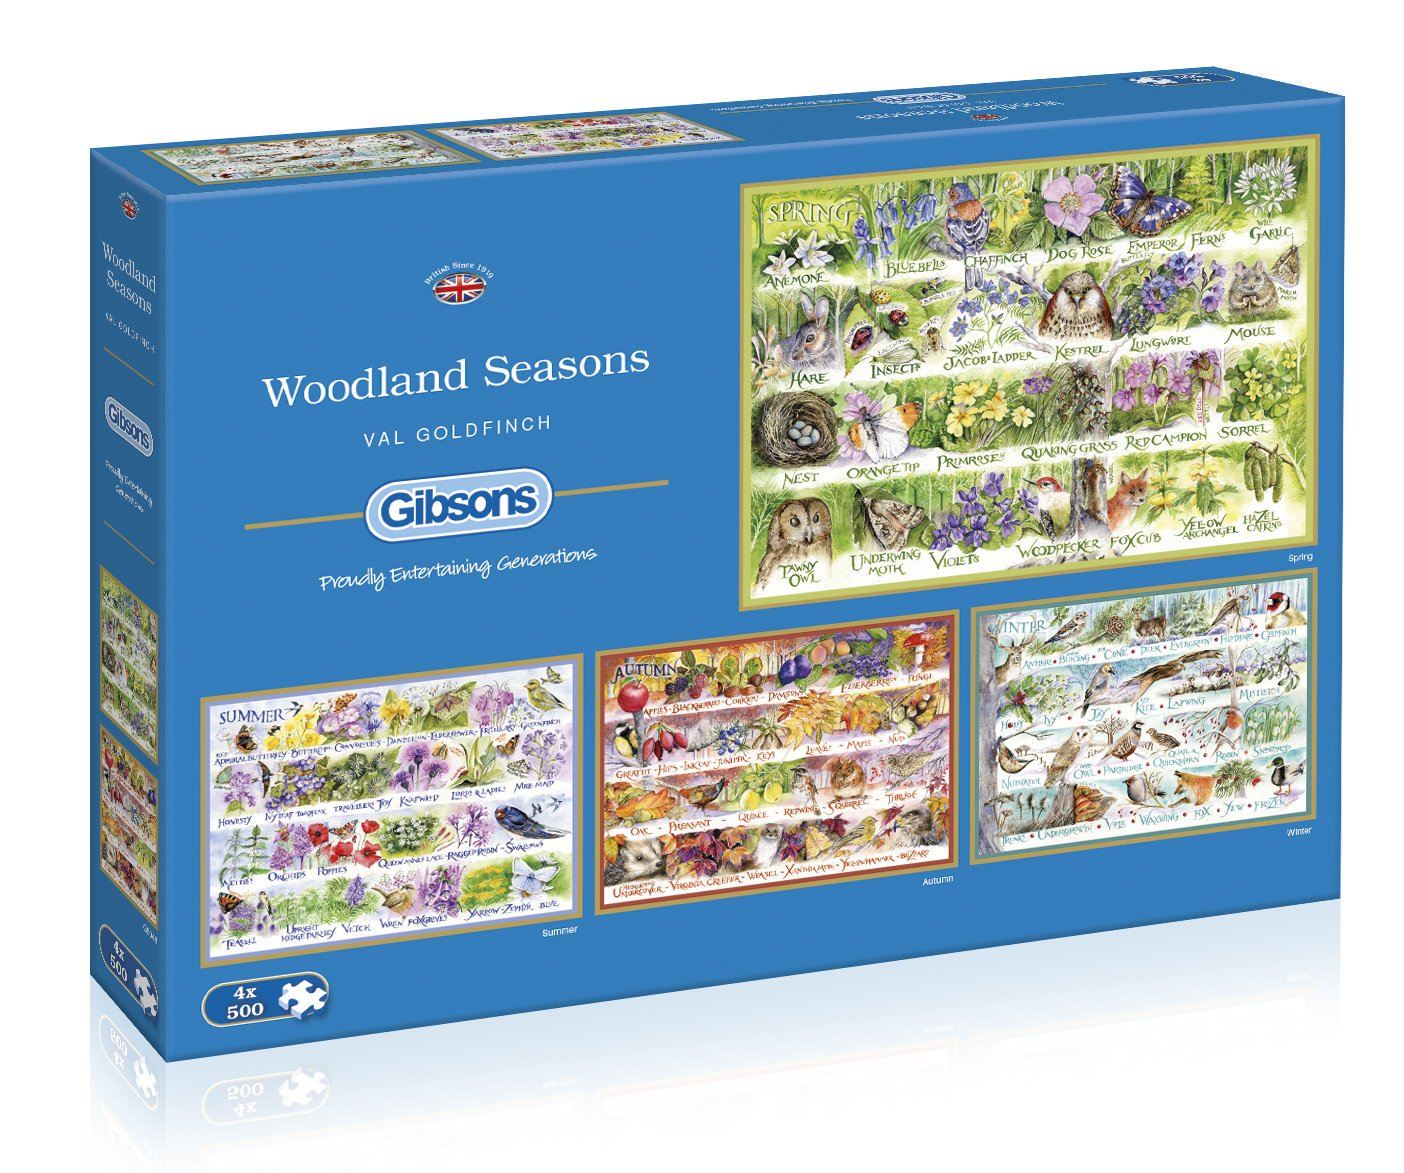 Gibsons Woodland Seasons Jigsaw Puzzle, 4×500 piece